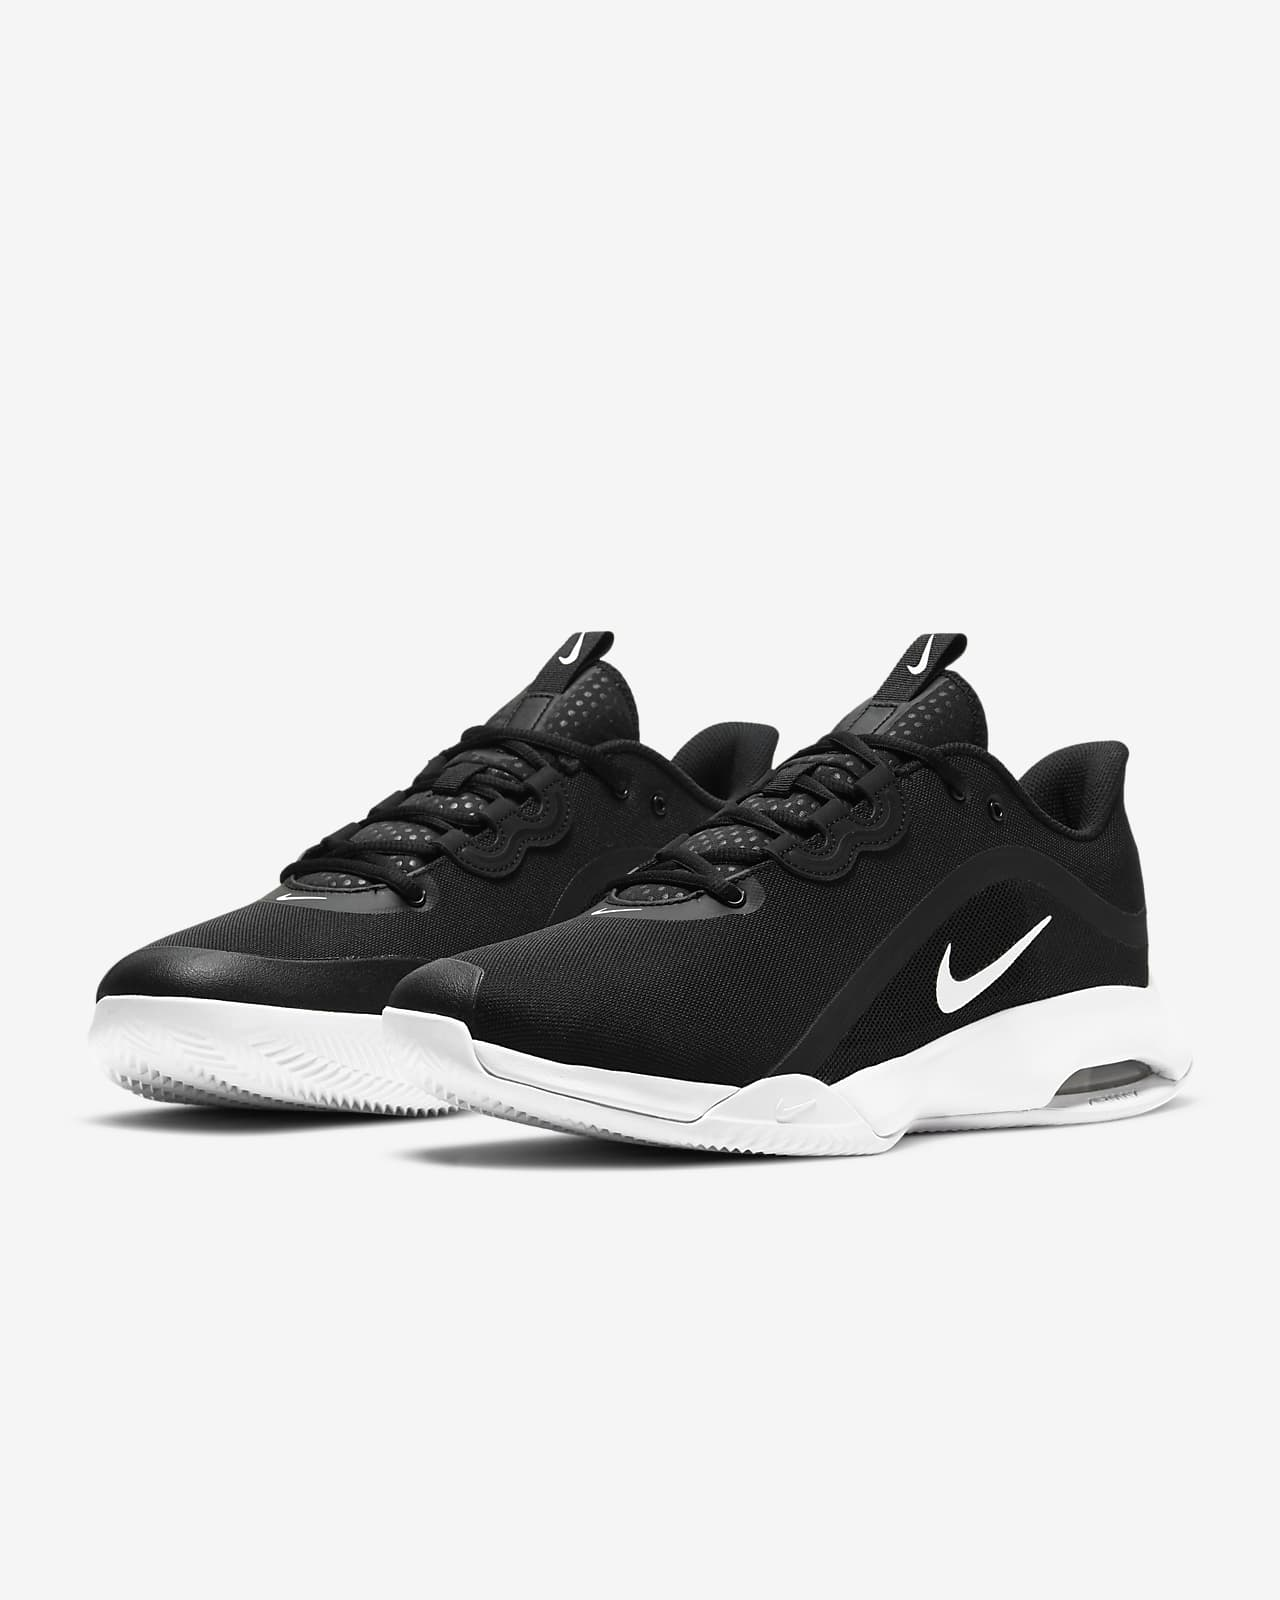 NikeCourt Air Max Volley Men's Clay Tennis Shoe. Nike LU